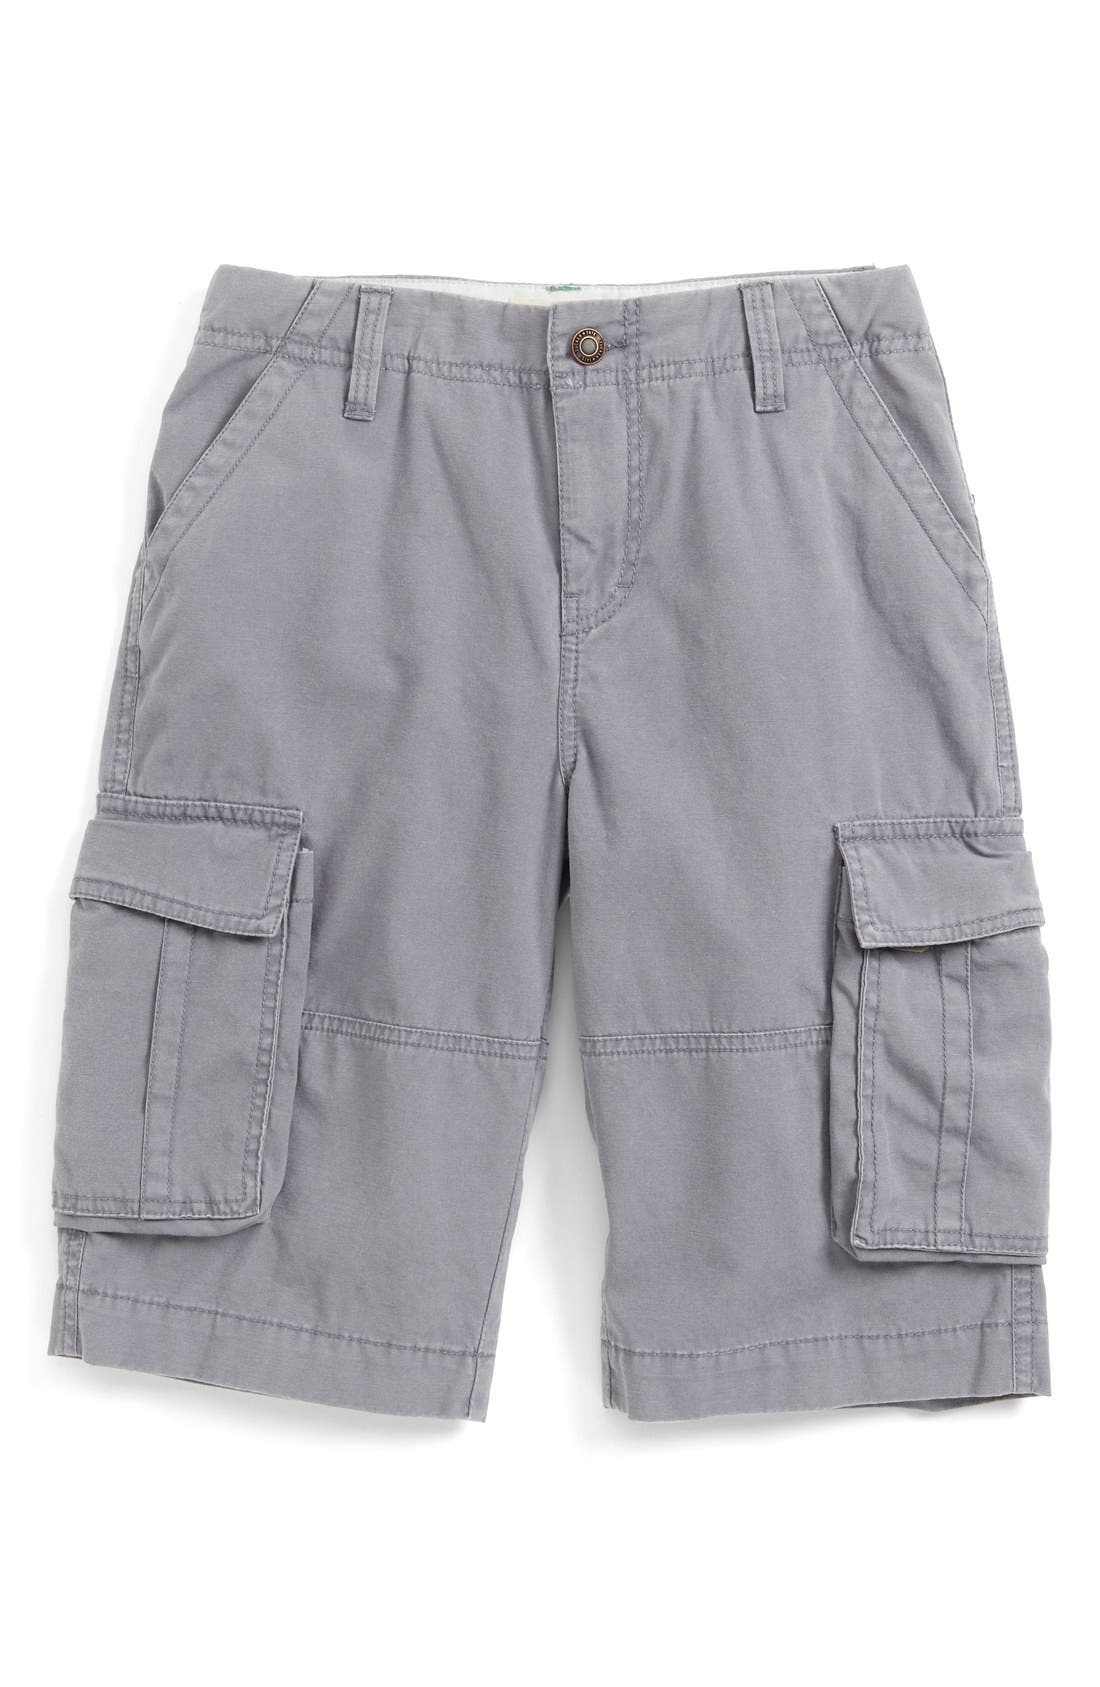 Main Image - Tucker + Tate Cargo Shorts (Little Boys)